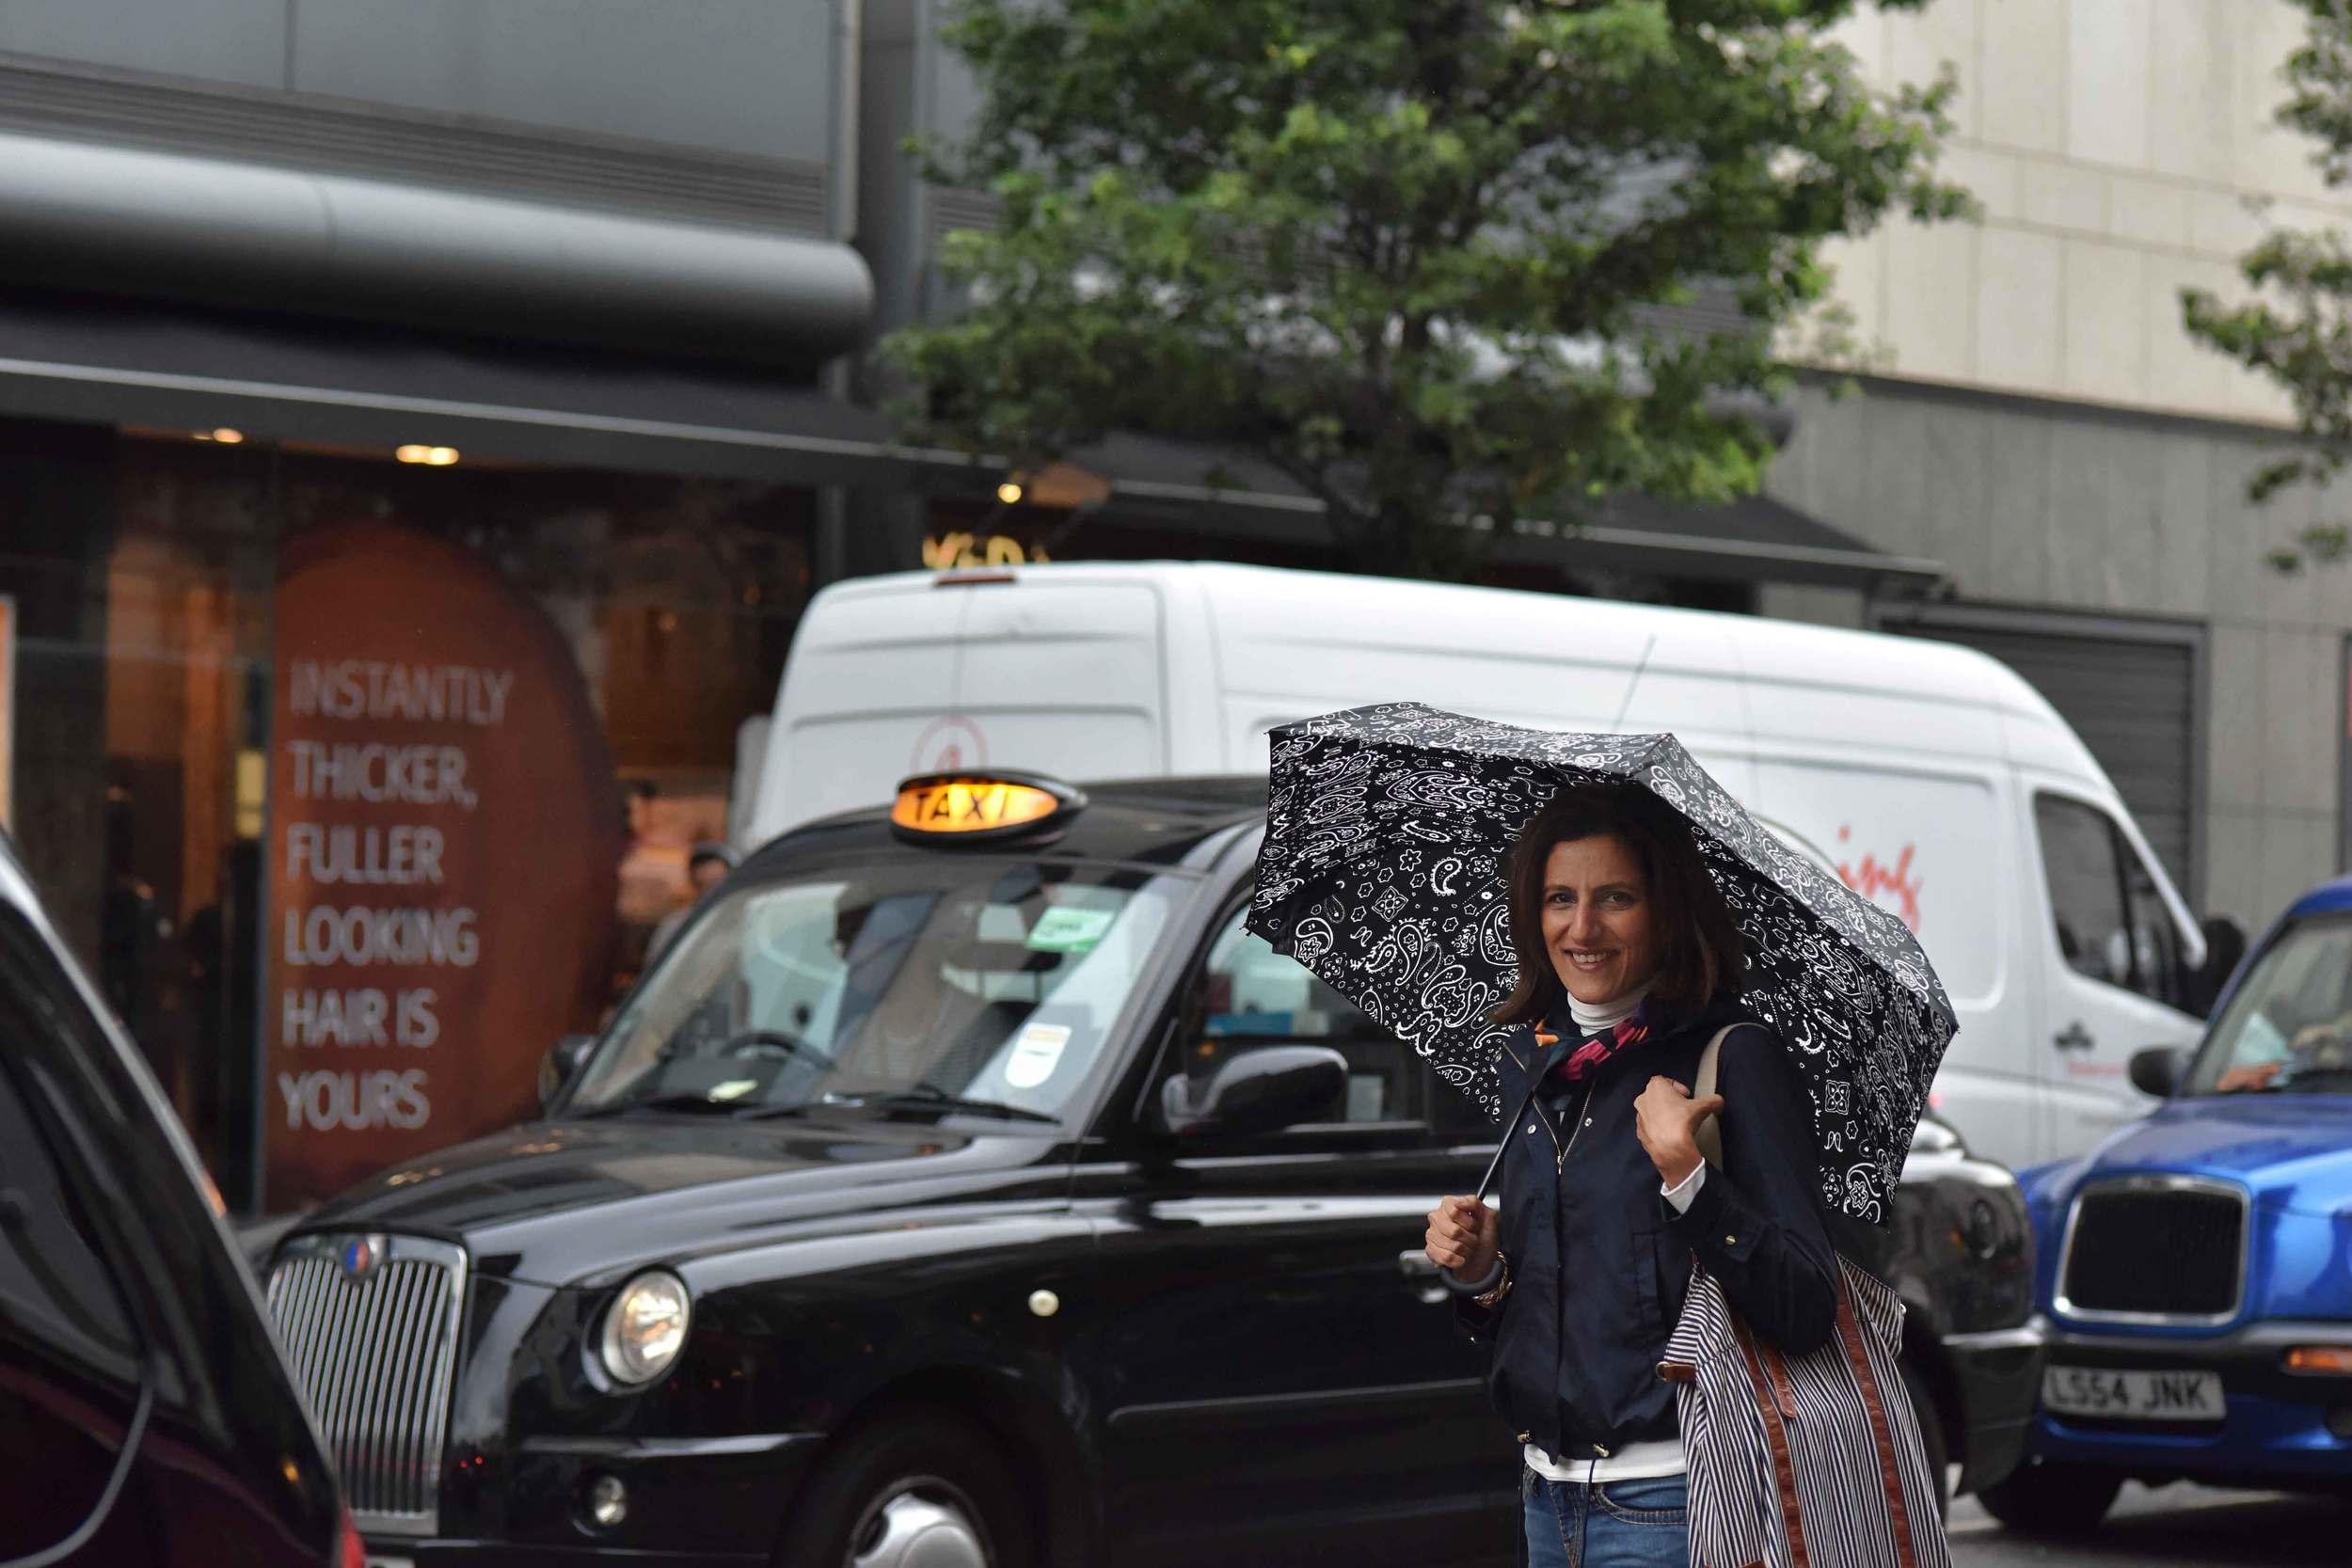 Zara water repellent jacket, Ralph Lauren polo sweater, Zara printed pocket square, Zara bandana print umbrella, True Religion jeans, a London cab, Covent Garden, London, UK. Image©sourcingstyle.com